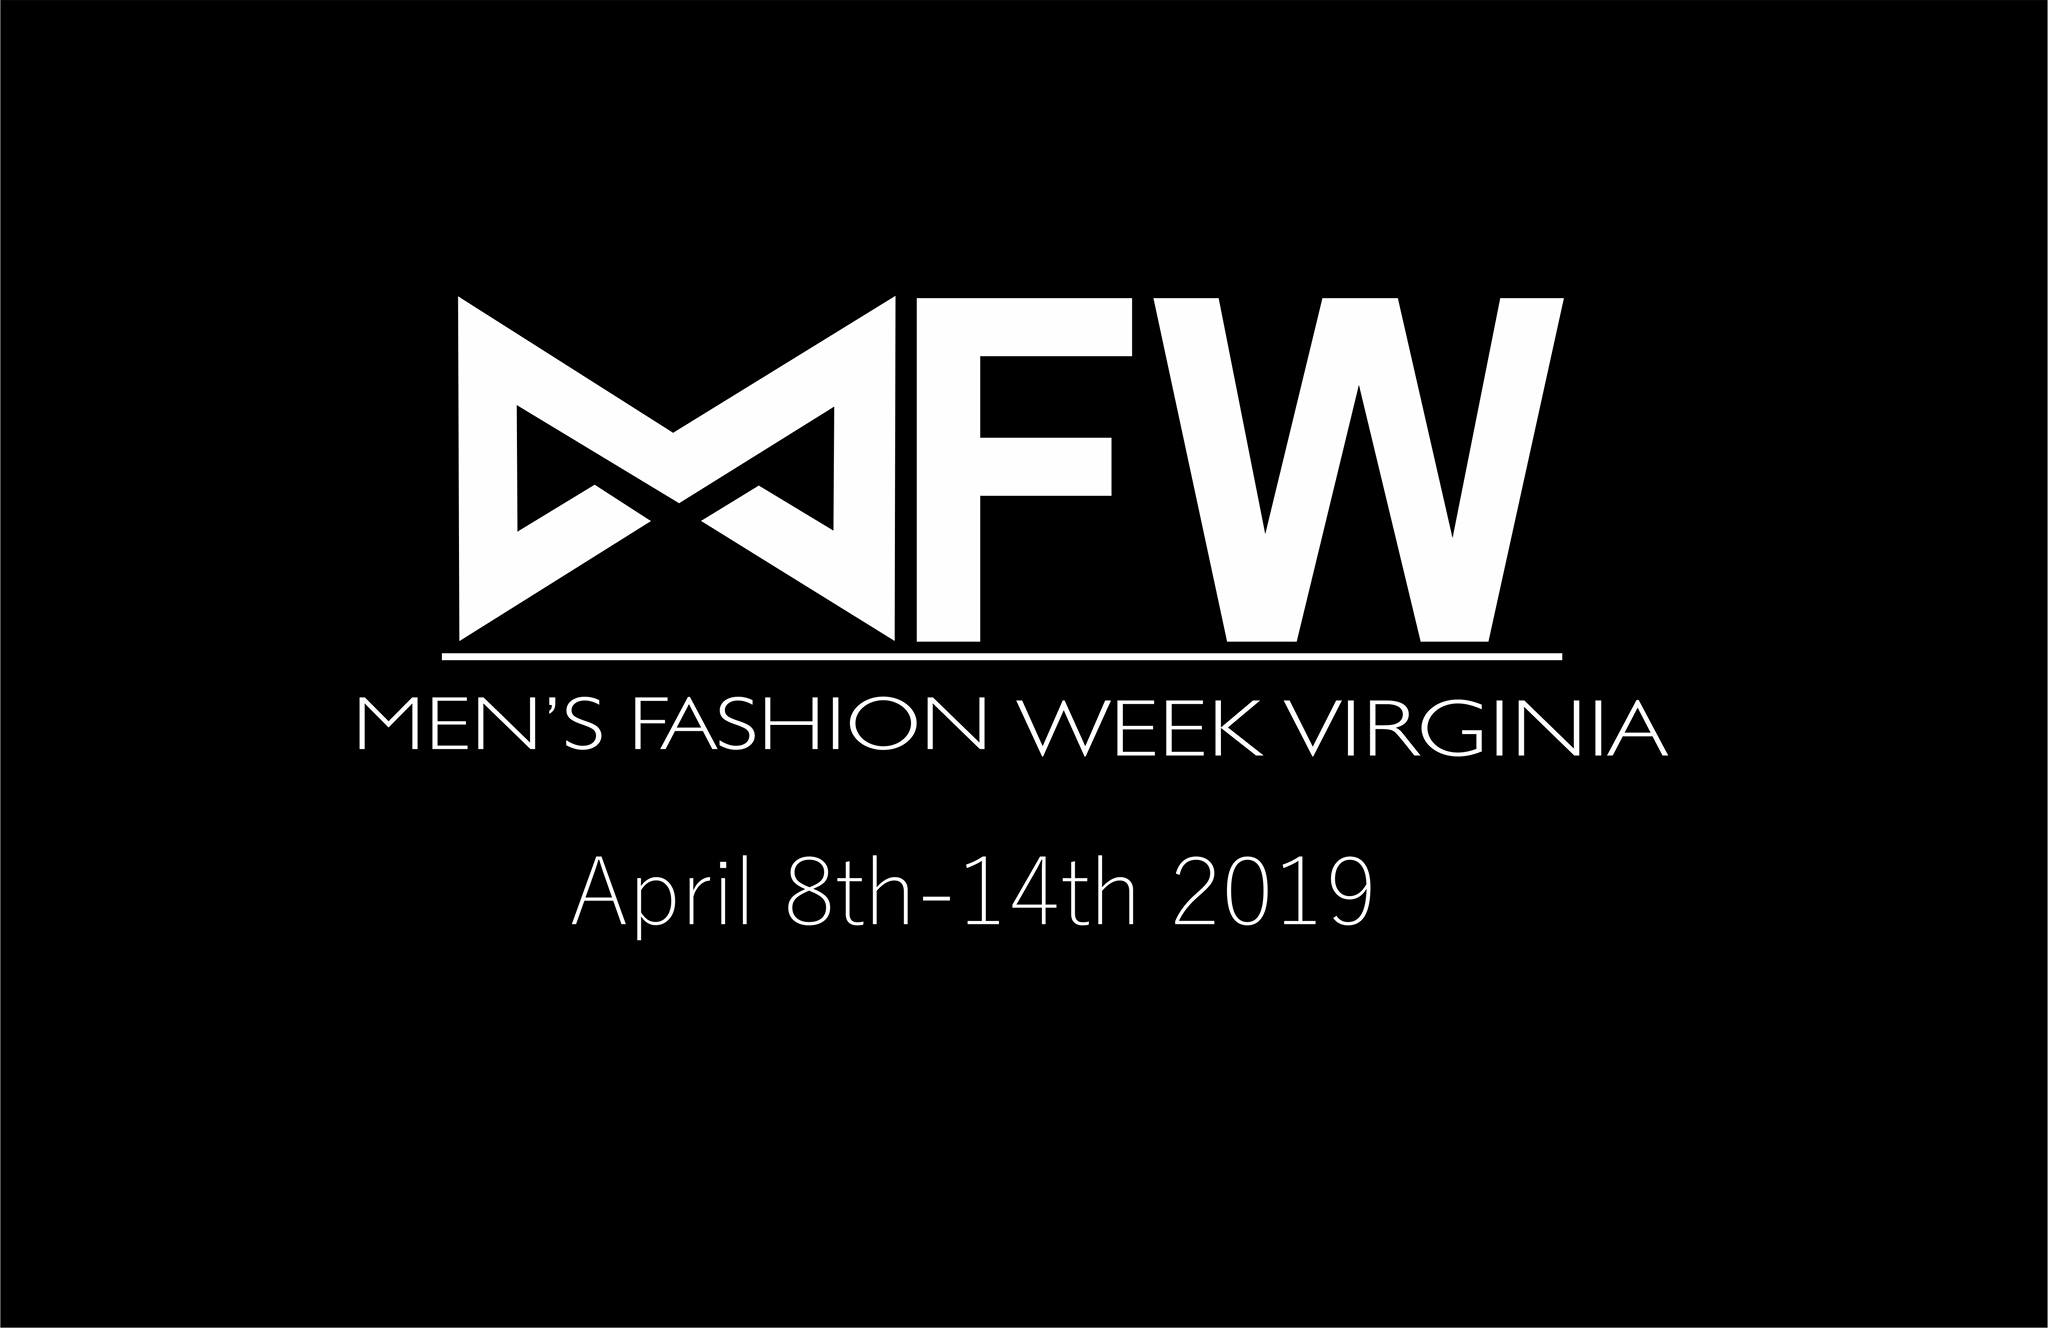 Men's fashion week_1554912349792.jpg.jpg